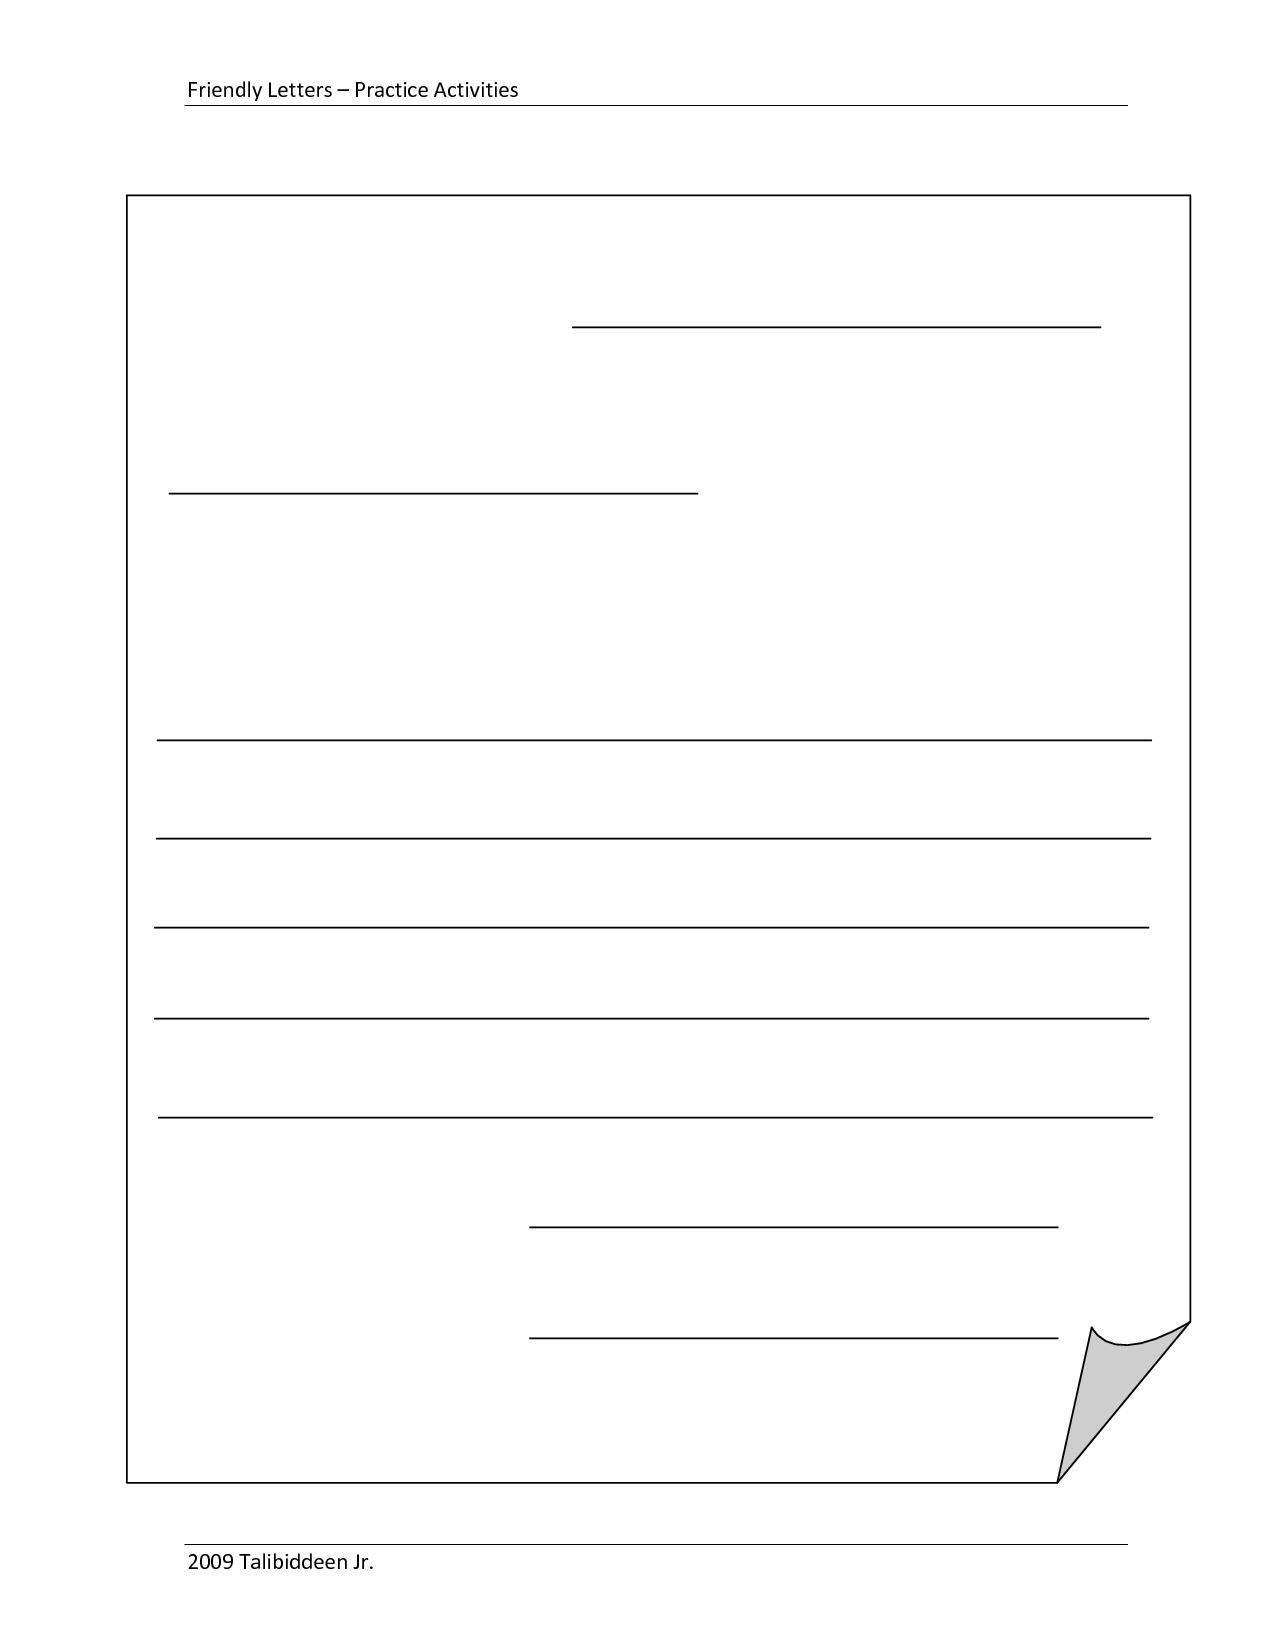 Blankletterformattemplate  Michelle  Friendly Letter Letter In Letter Writing Template For Kids